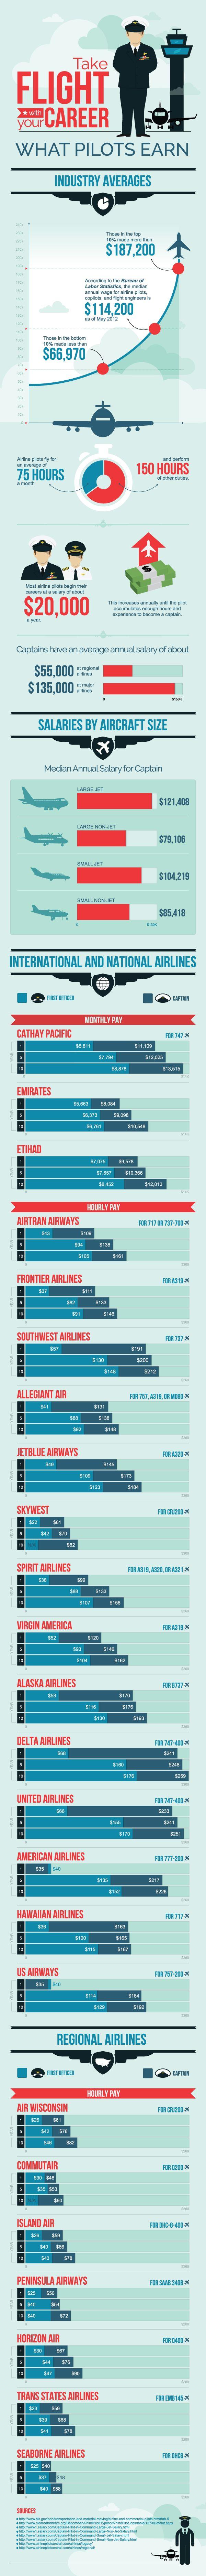 Airline Pilot Salaries Infographic